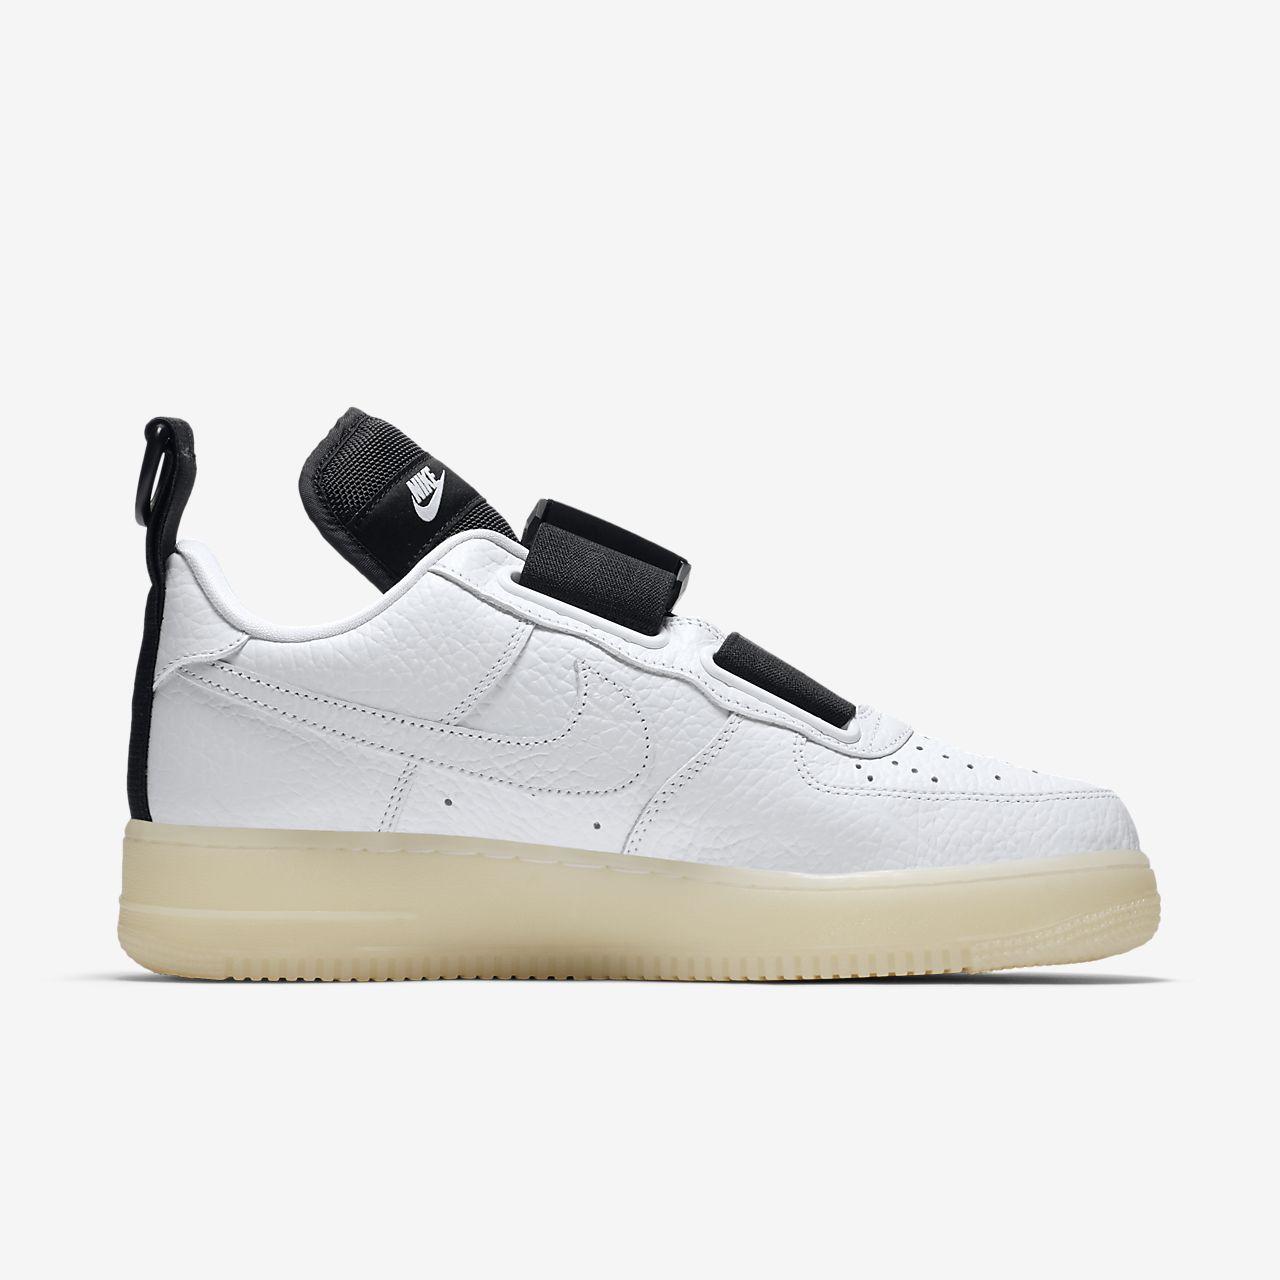 59e0f402bdfd4 Low Resolution Nike Air Force 1 Utility QS Men's Shoe Nike Air Force 1  Utility QS Men's Shoe